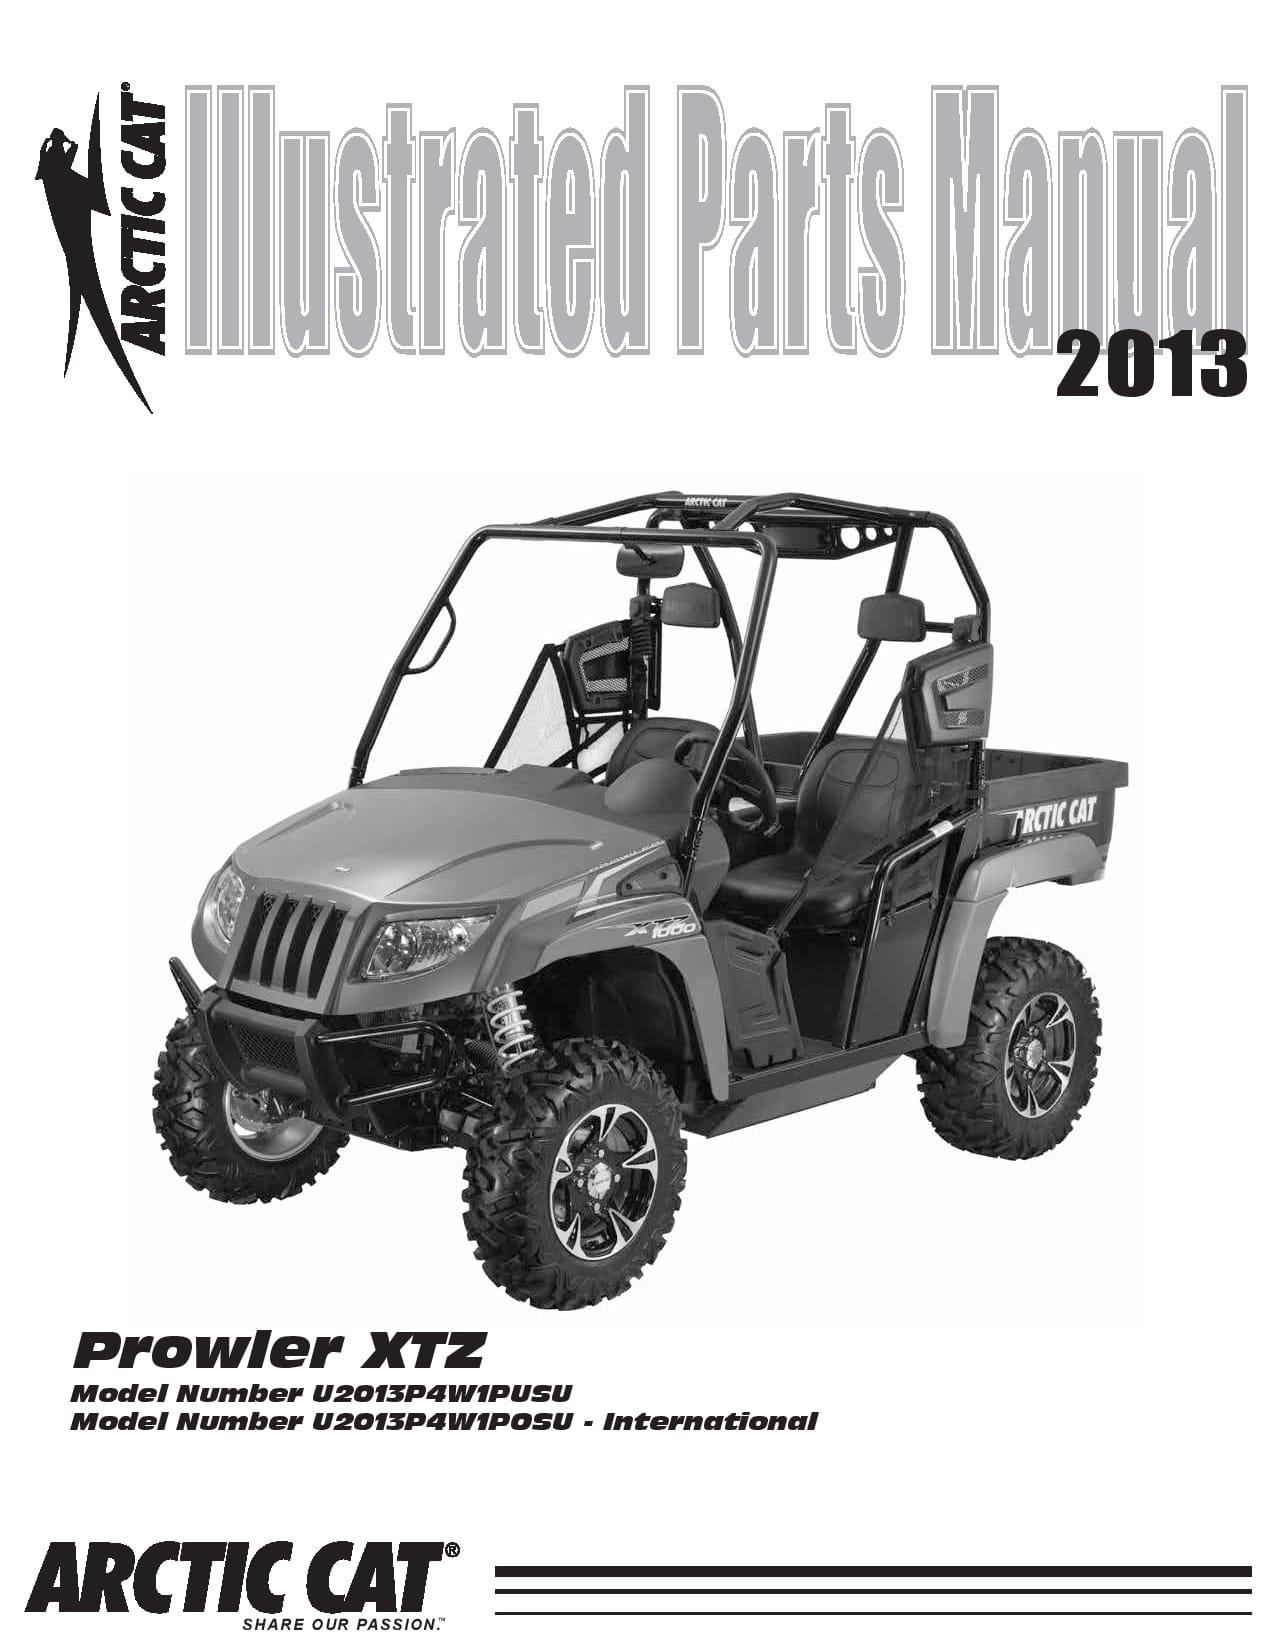 ARCTIC CAT 2013 Prowler XTZ NH part manual PDF Download